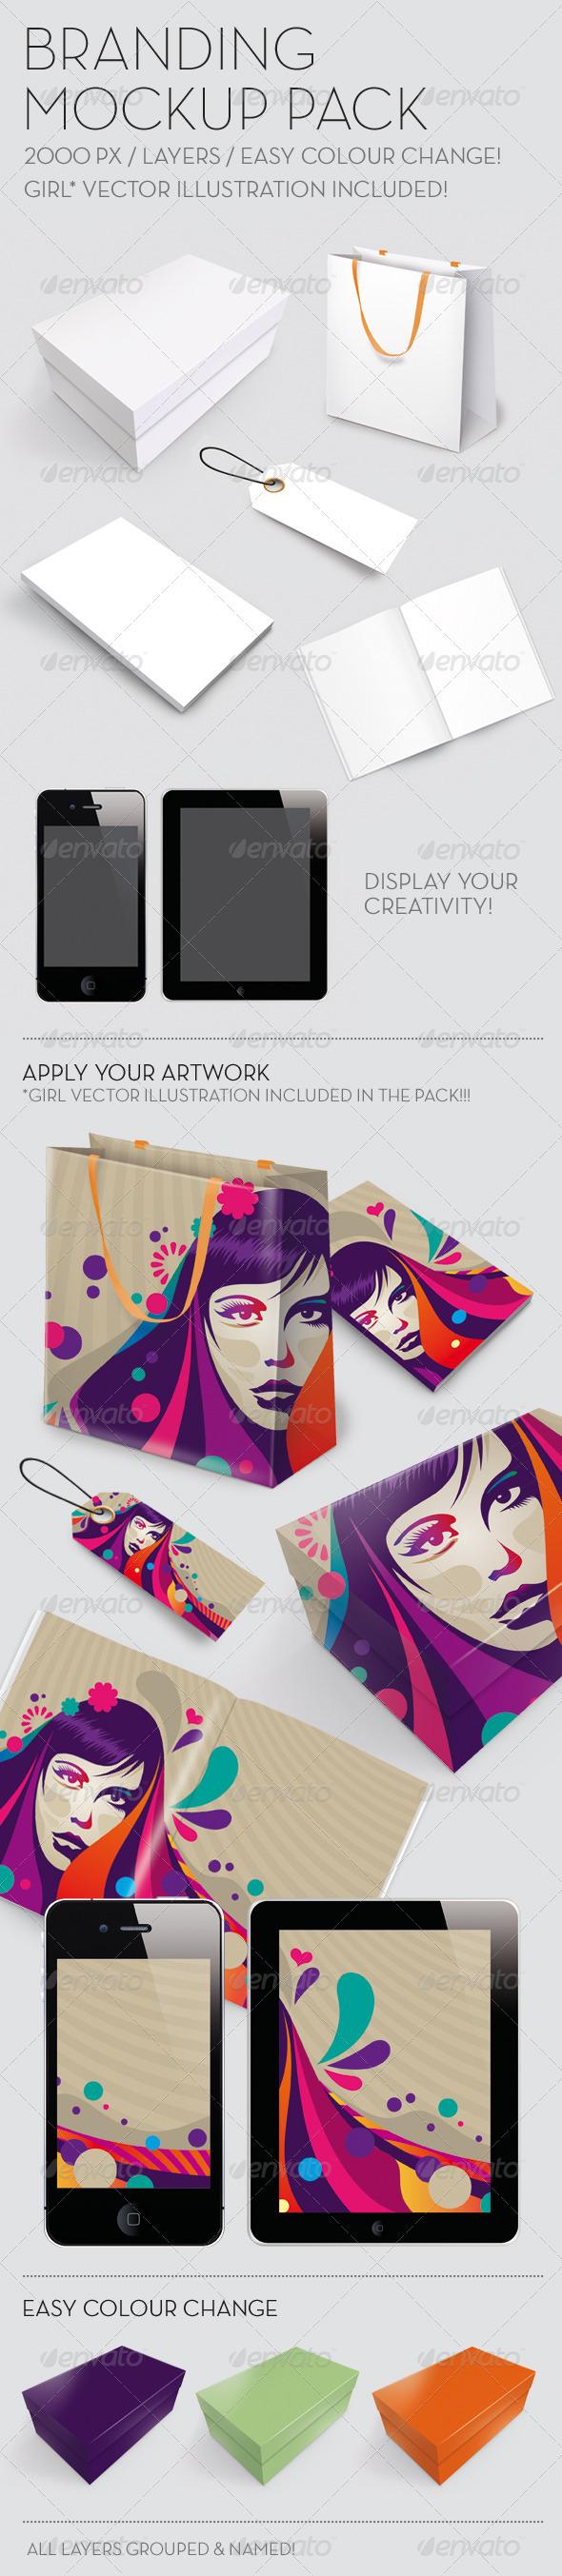 GraphicRiver Branding Mockup Pack 680938